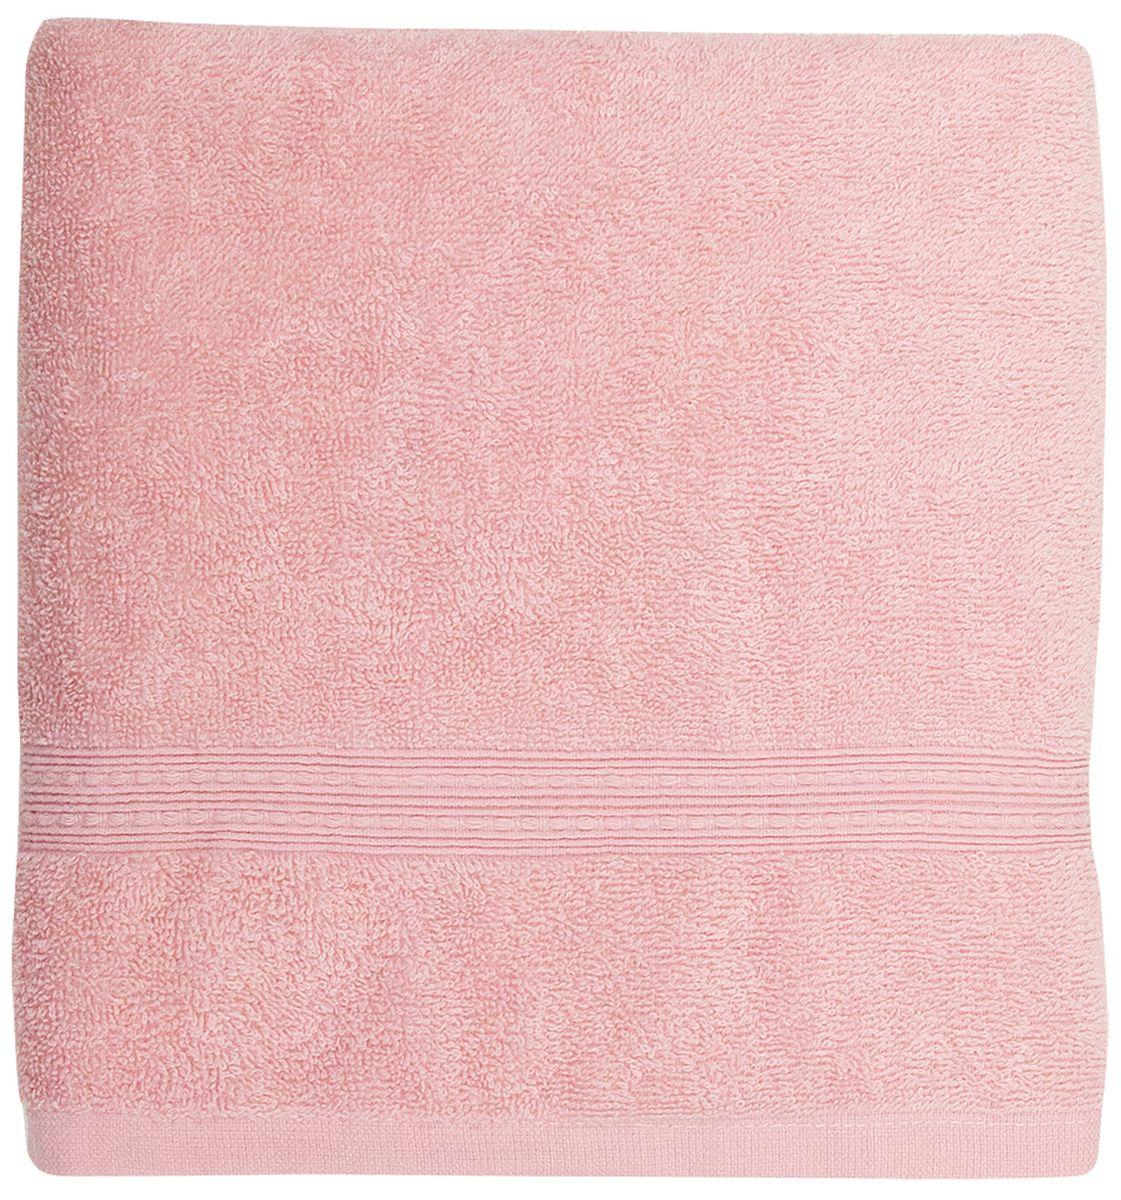 Полотенце банное Bonita Classic, махровое, цвет: роза, 50 x 90 см391602Полотенце банное 50*90 Bonita Classic, махровое